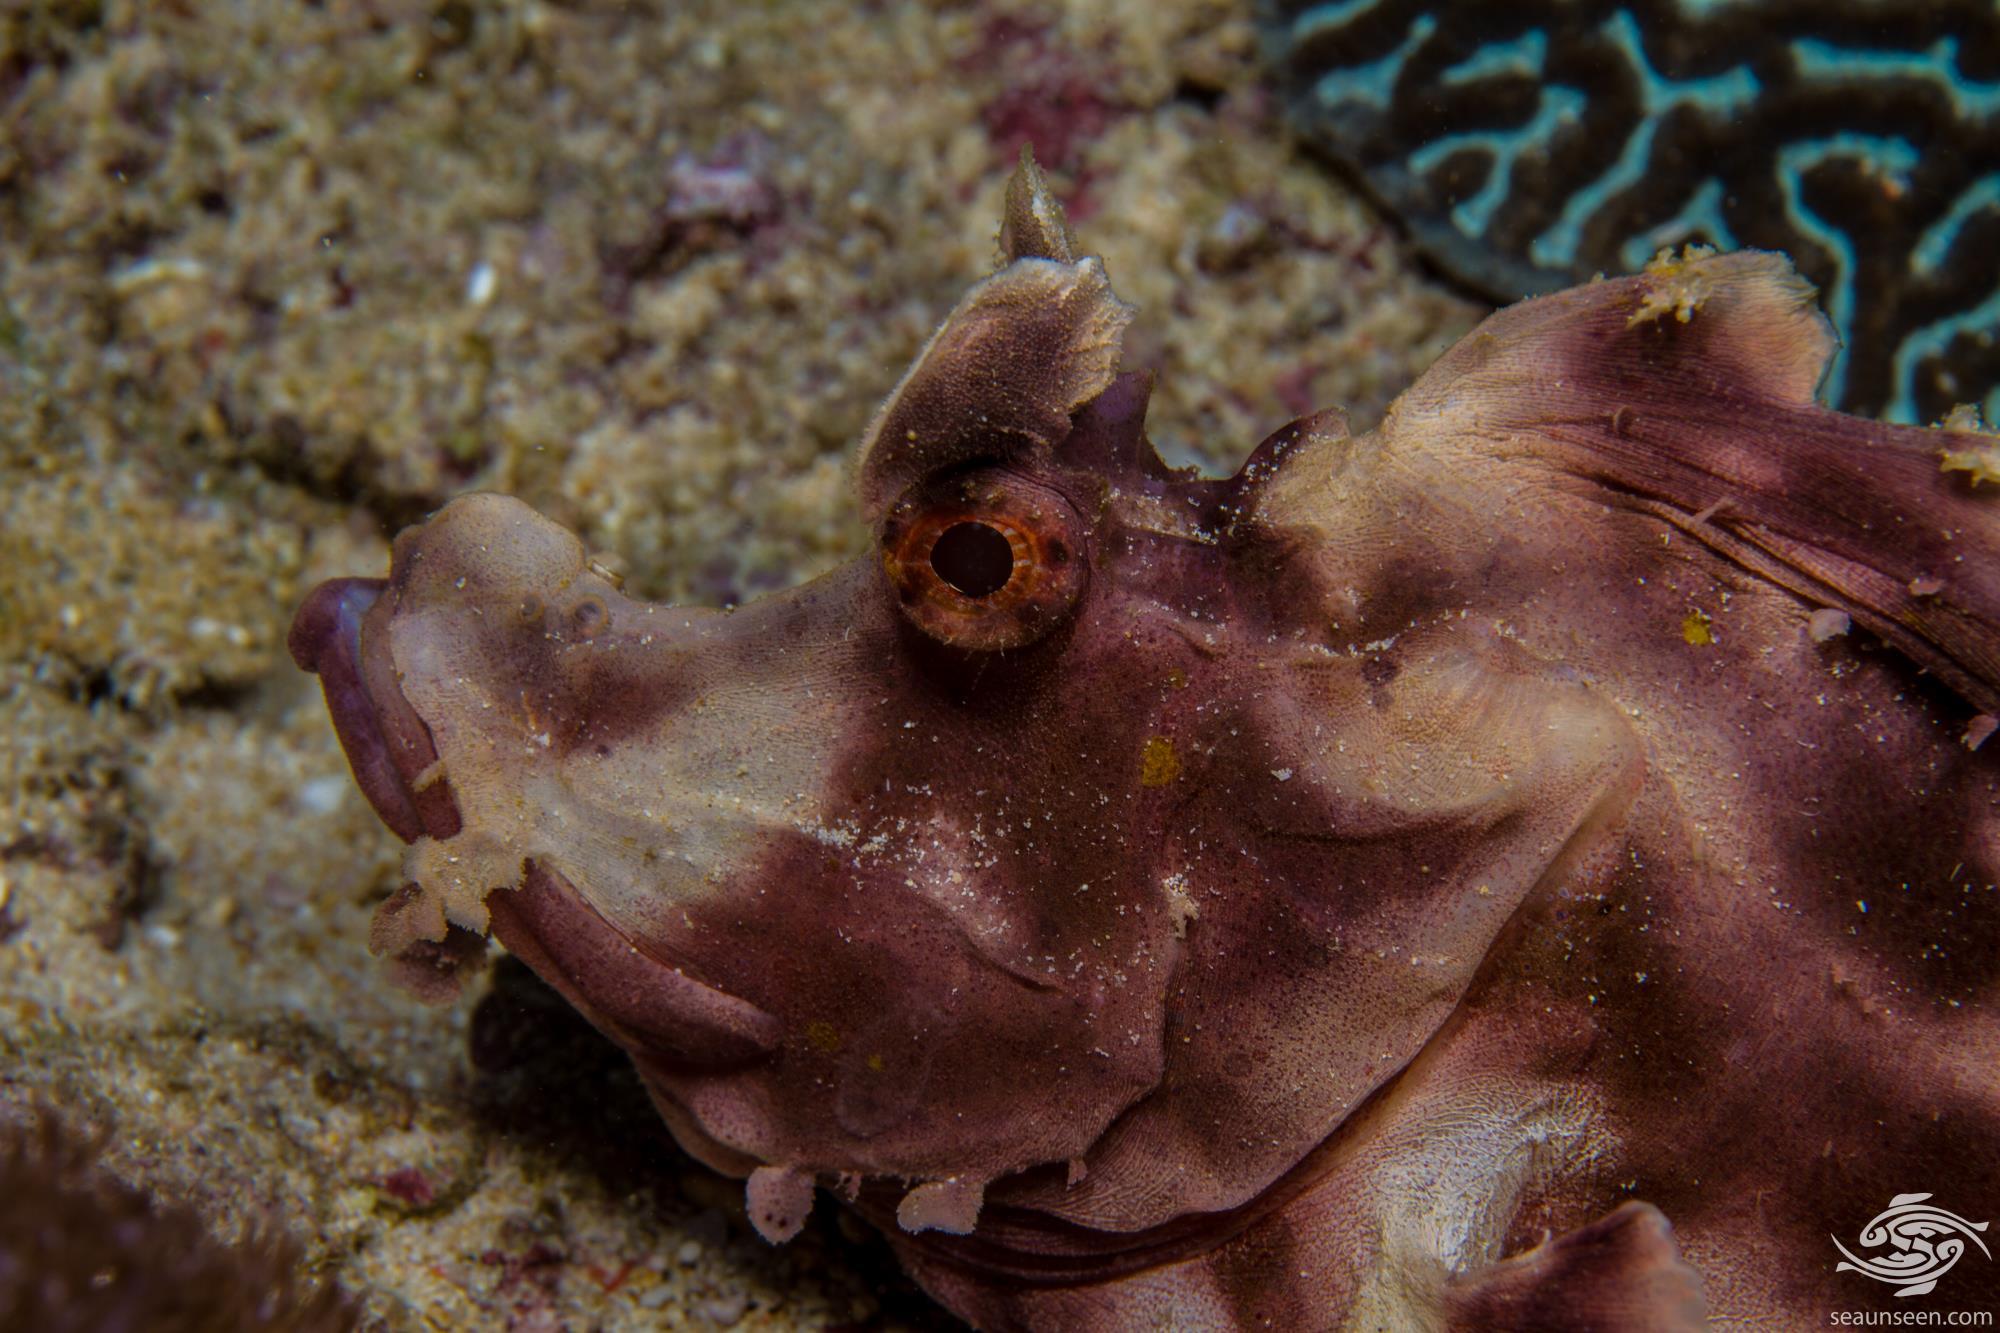 Paddle-flap scorpionfish, Popeyed Scorpionfish or Eschmeyer's scorpionfish, Rhinopias eschmeyeri